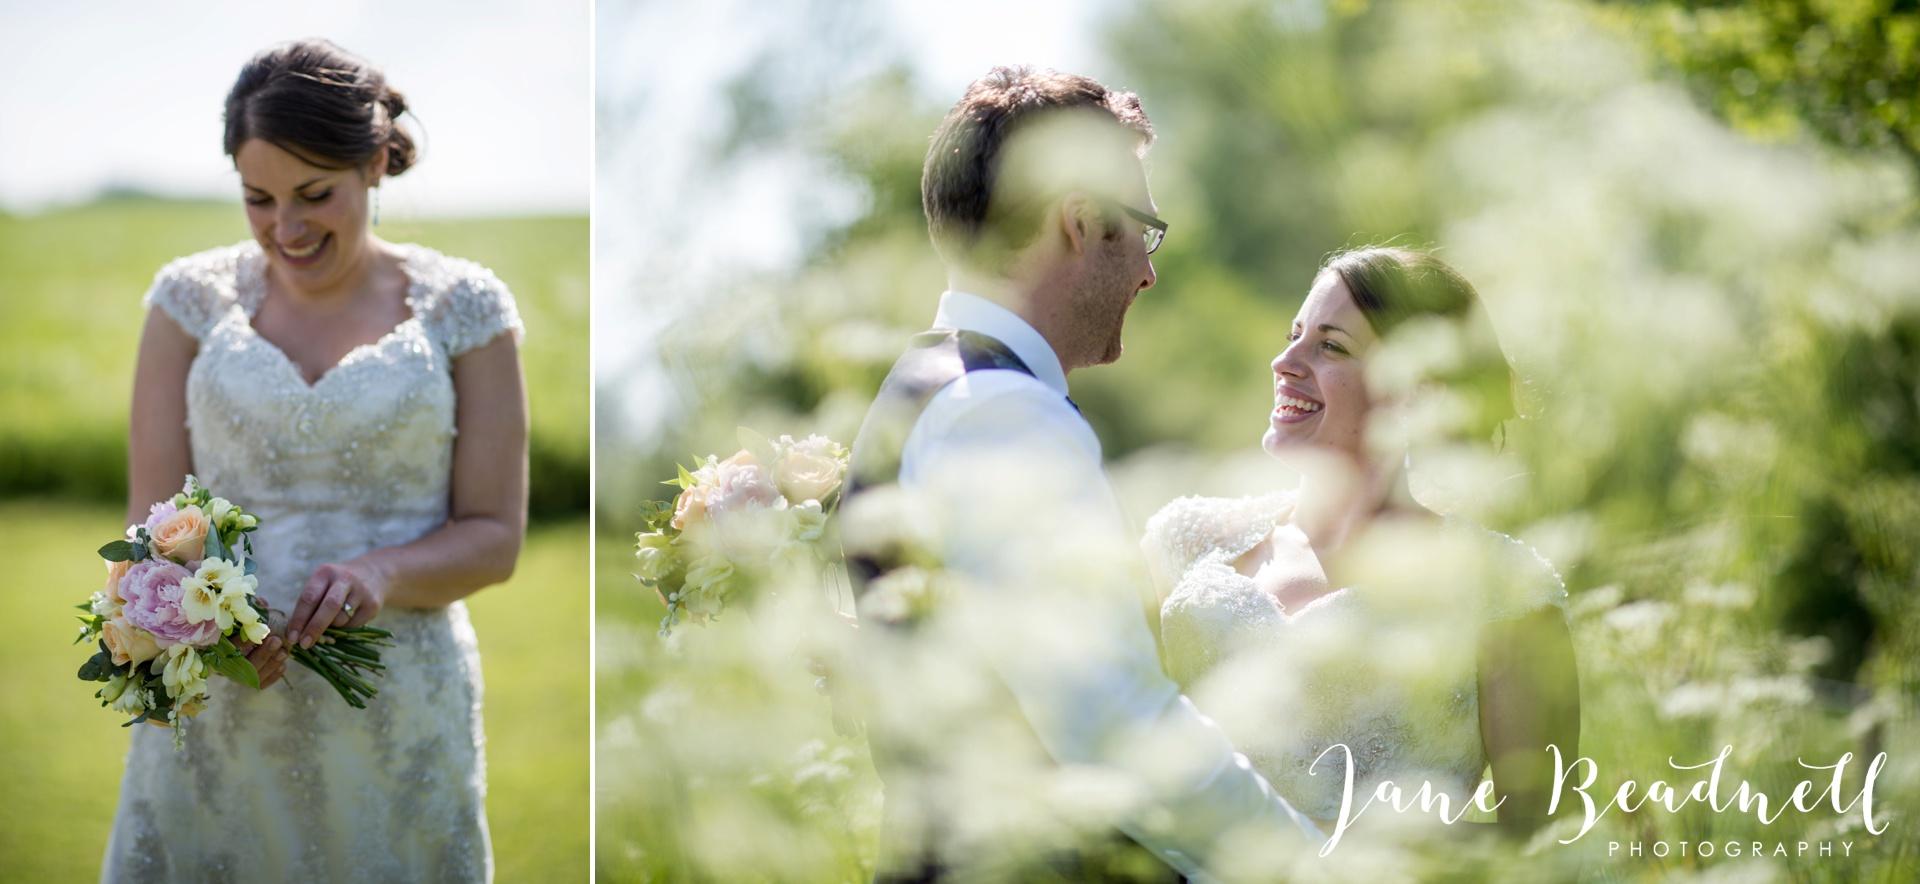 Bath Abbey wedding photography by fine art wedding photographer Leeds Jane Beadnell_50